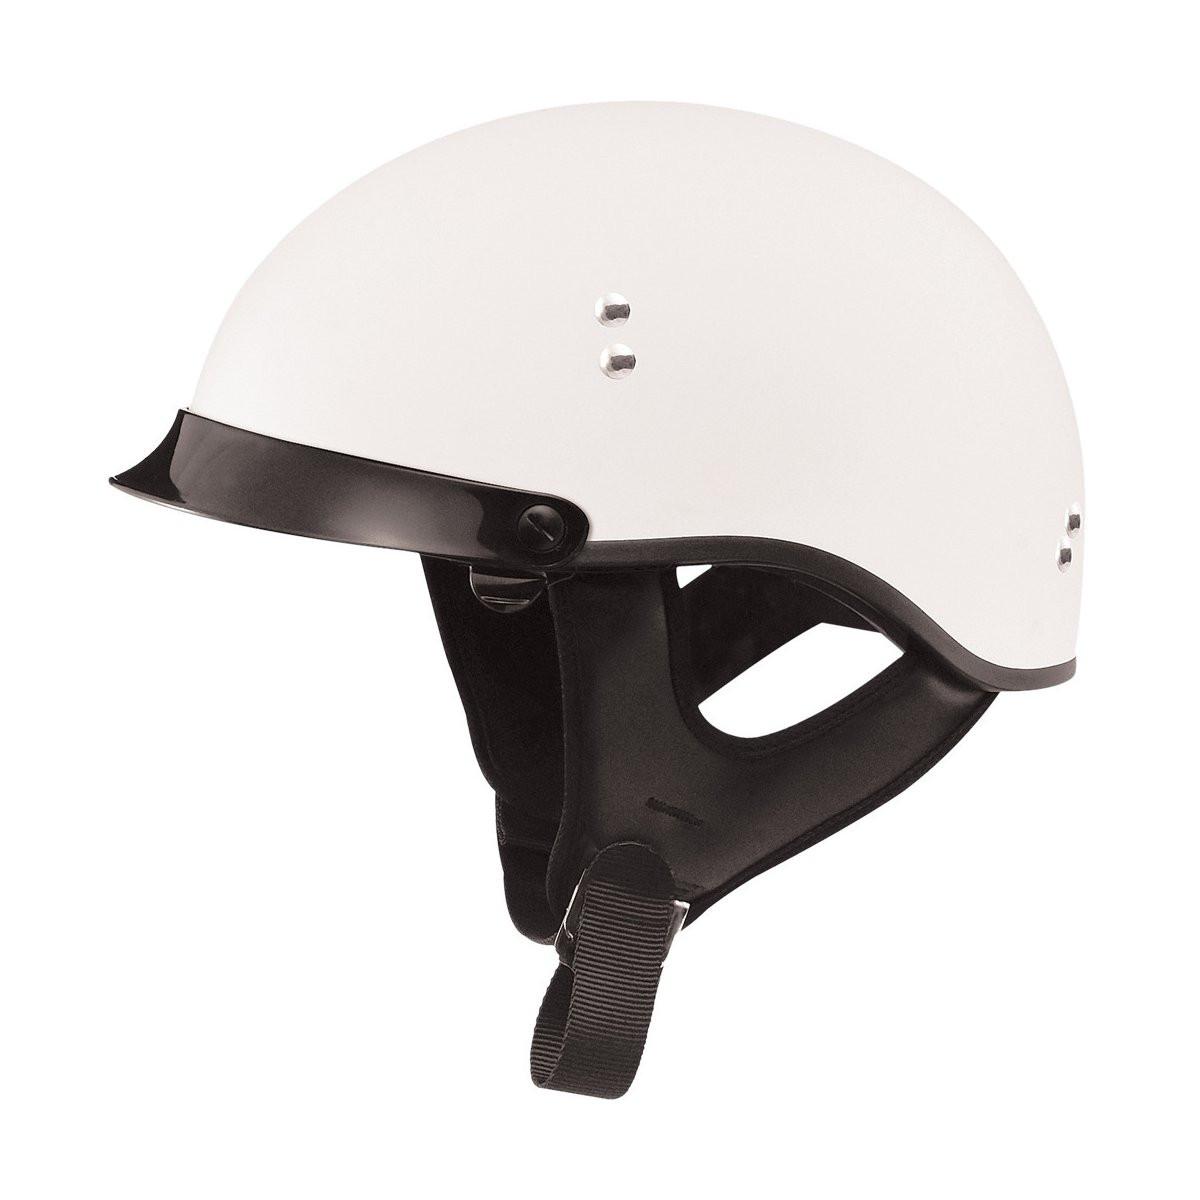 GMax HH65 Full Dress Helmet - Solid | 10% ($8.49) Off